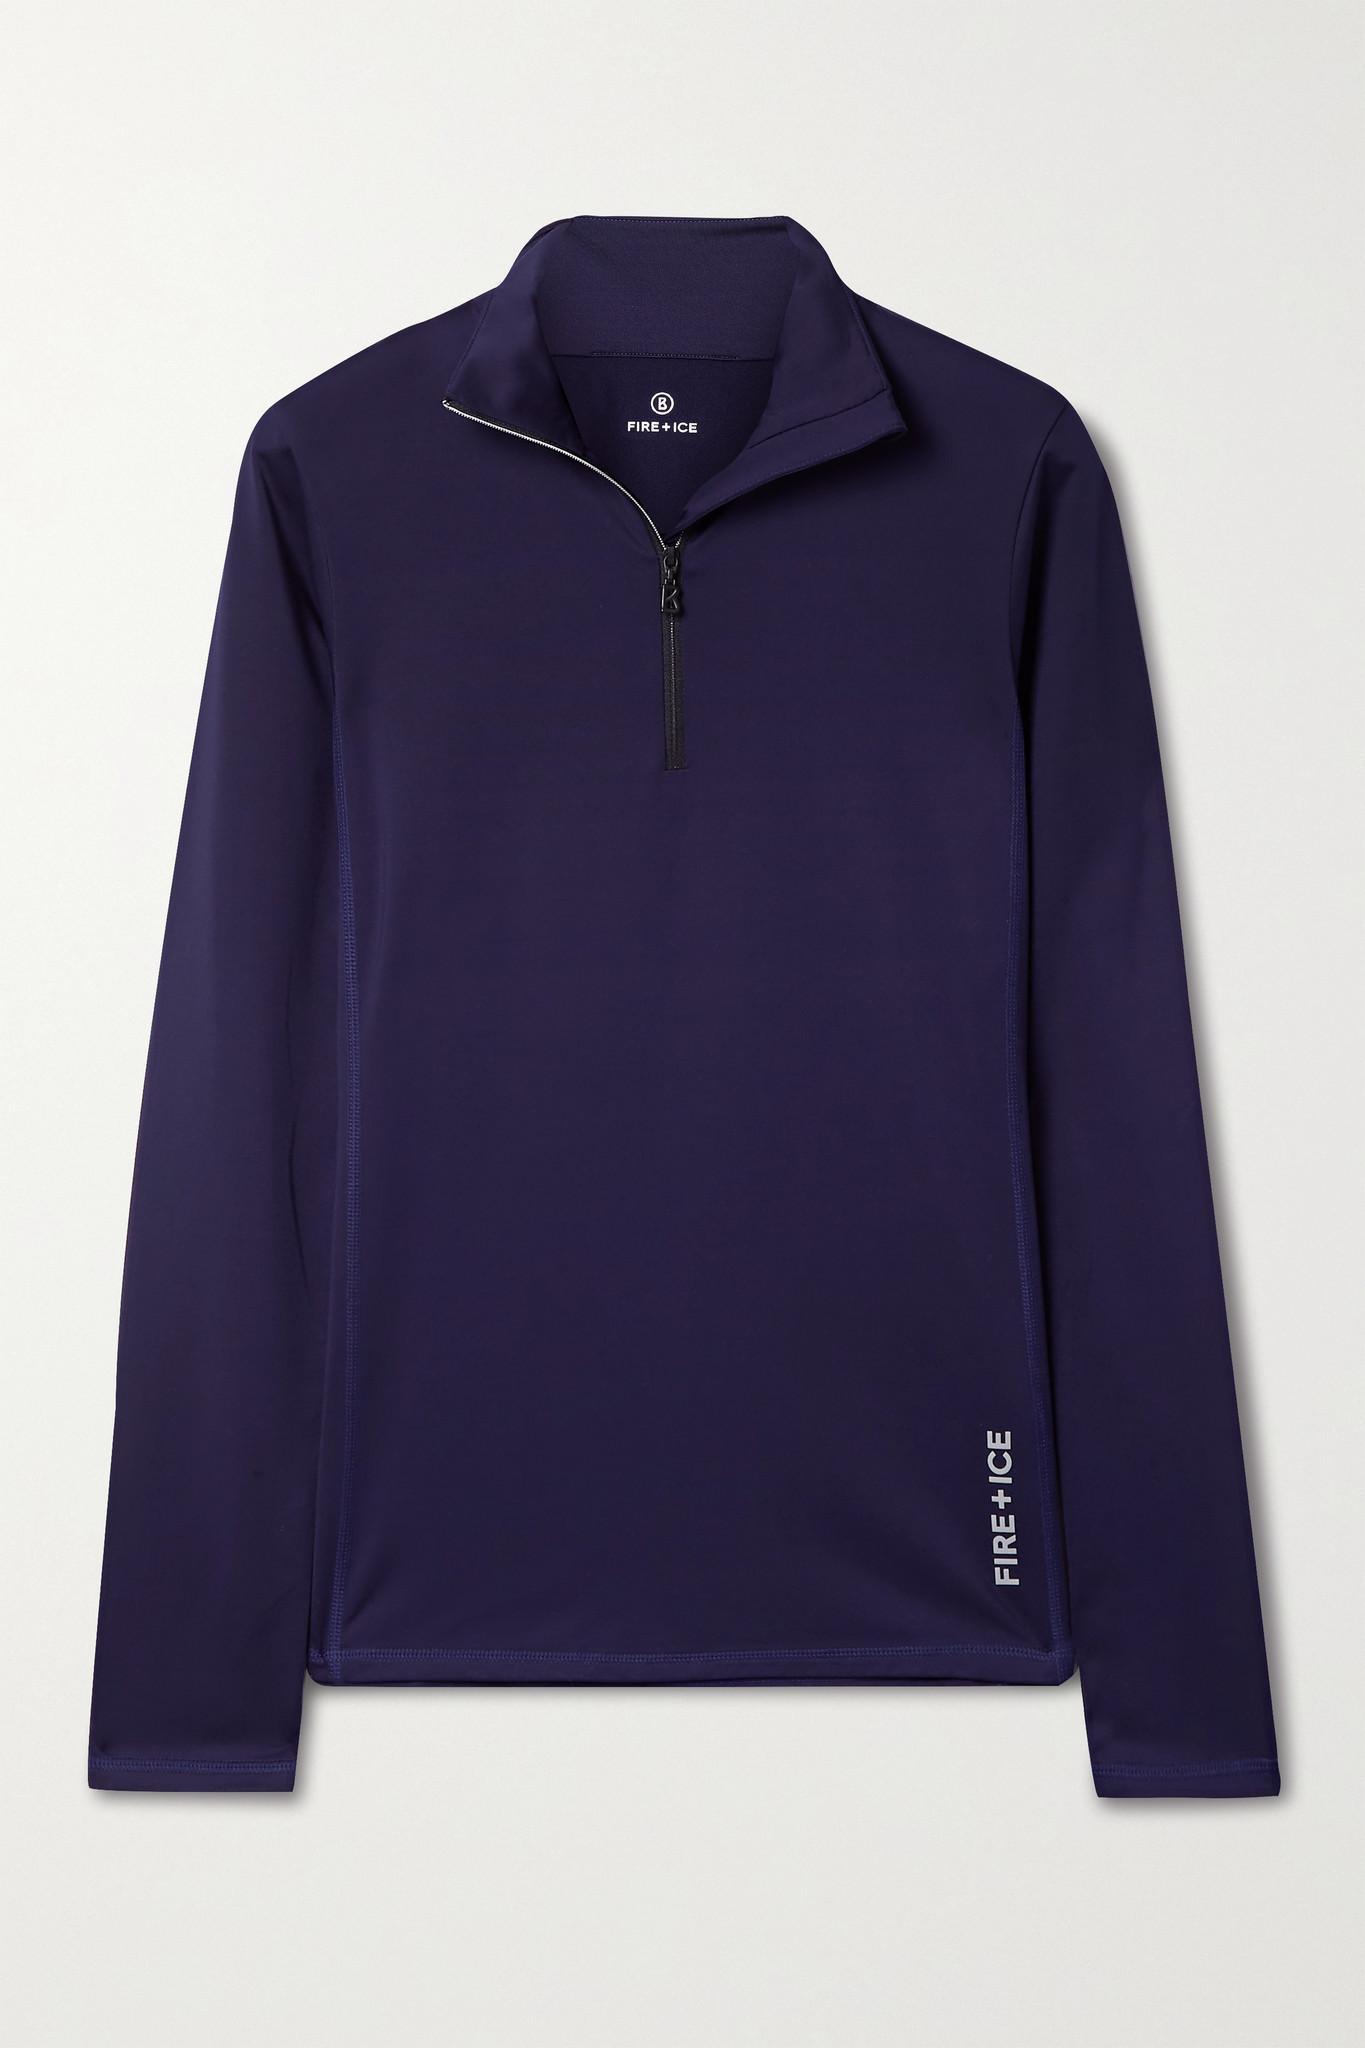 BOGNER FIRE+ICE - Margo 2 弹力平纹布打底上衣 - 紫色 - small